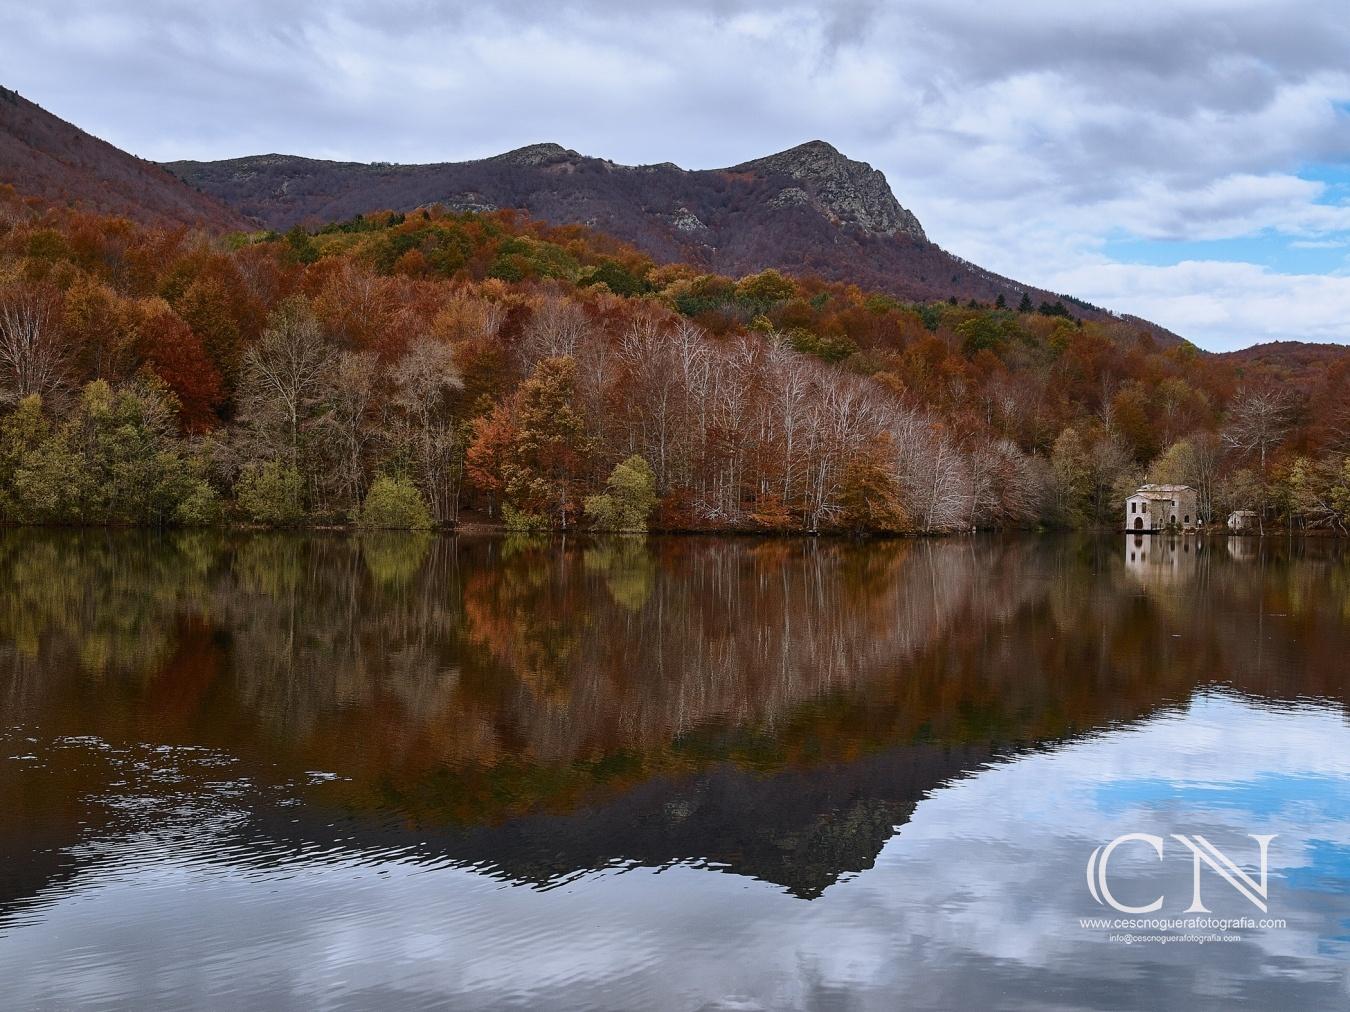 Paisatge i Natura - Cesc Noguera Fotografia,  Architectural & Interior design photographer / Landscape Photography.